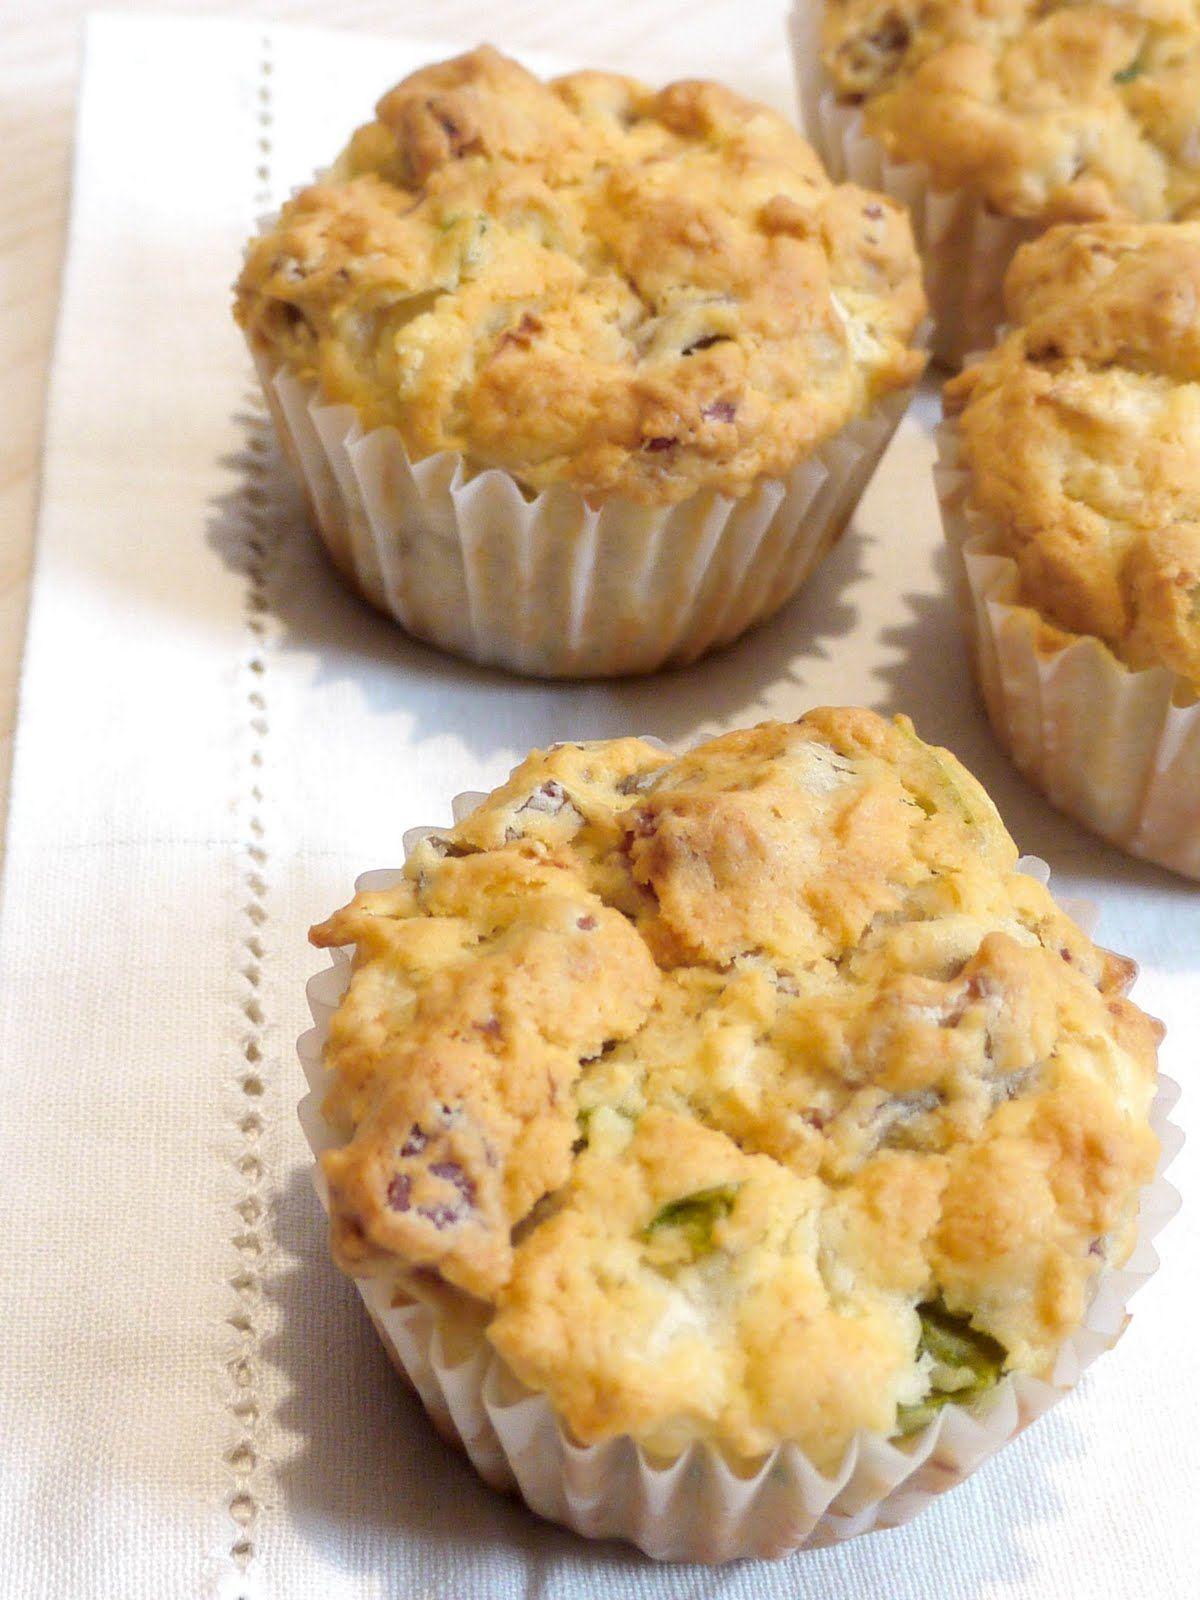 Aliter Dulcia: muffins de jamón y setas